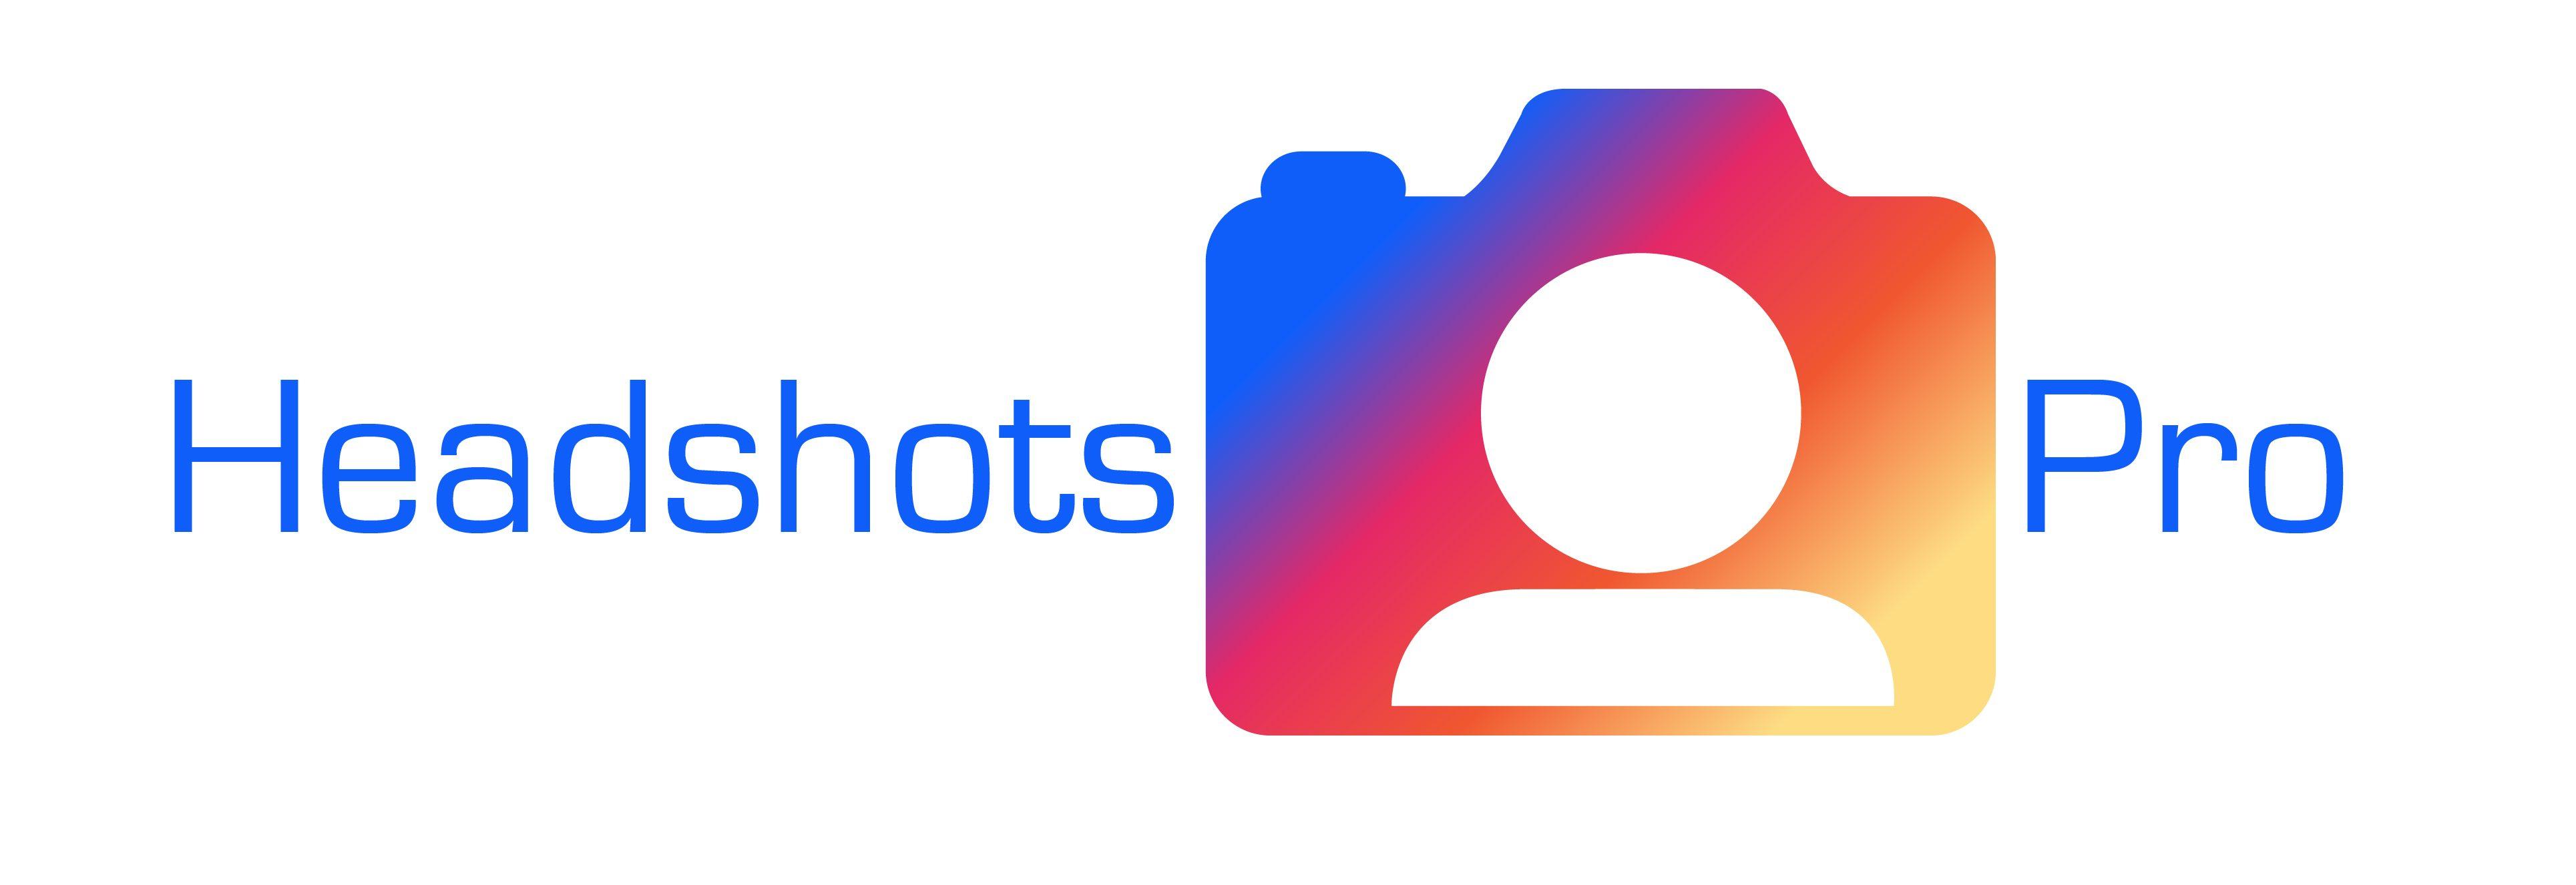 Headshots Pro